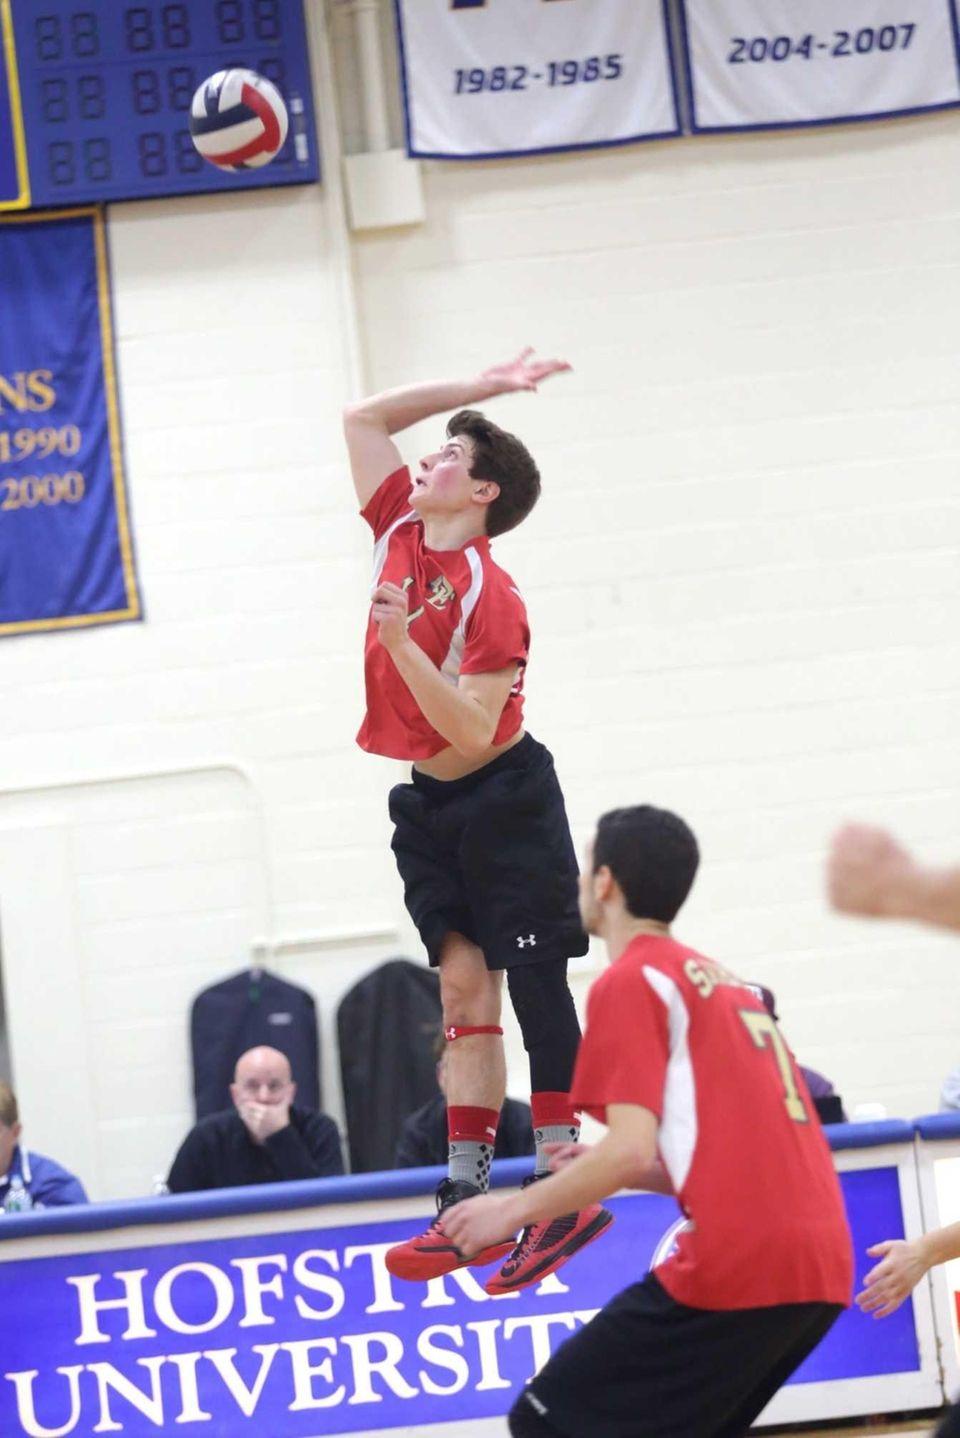 Steve Rodriguez of Sachem East looks to hit